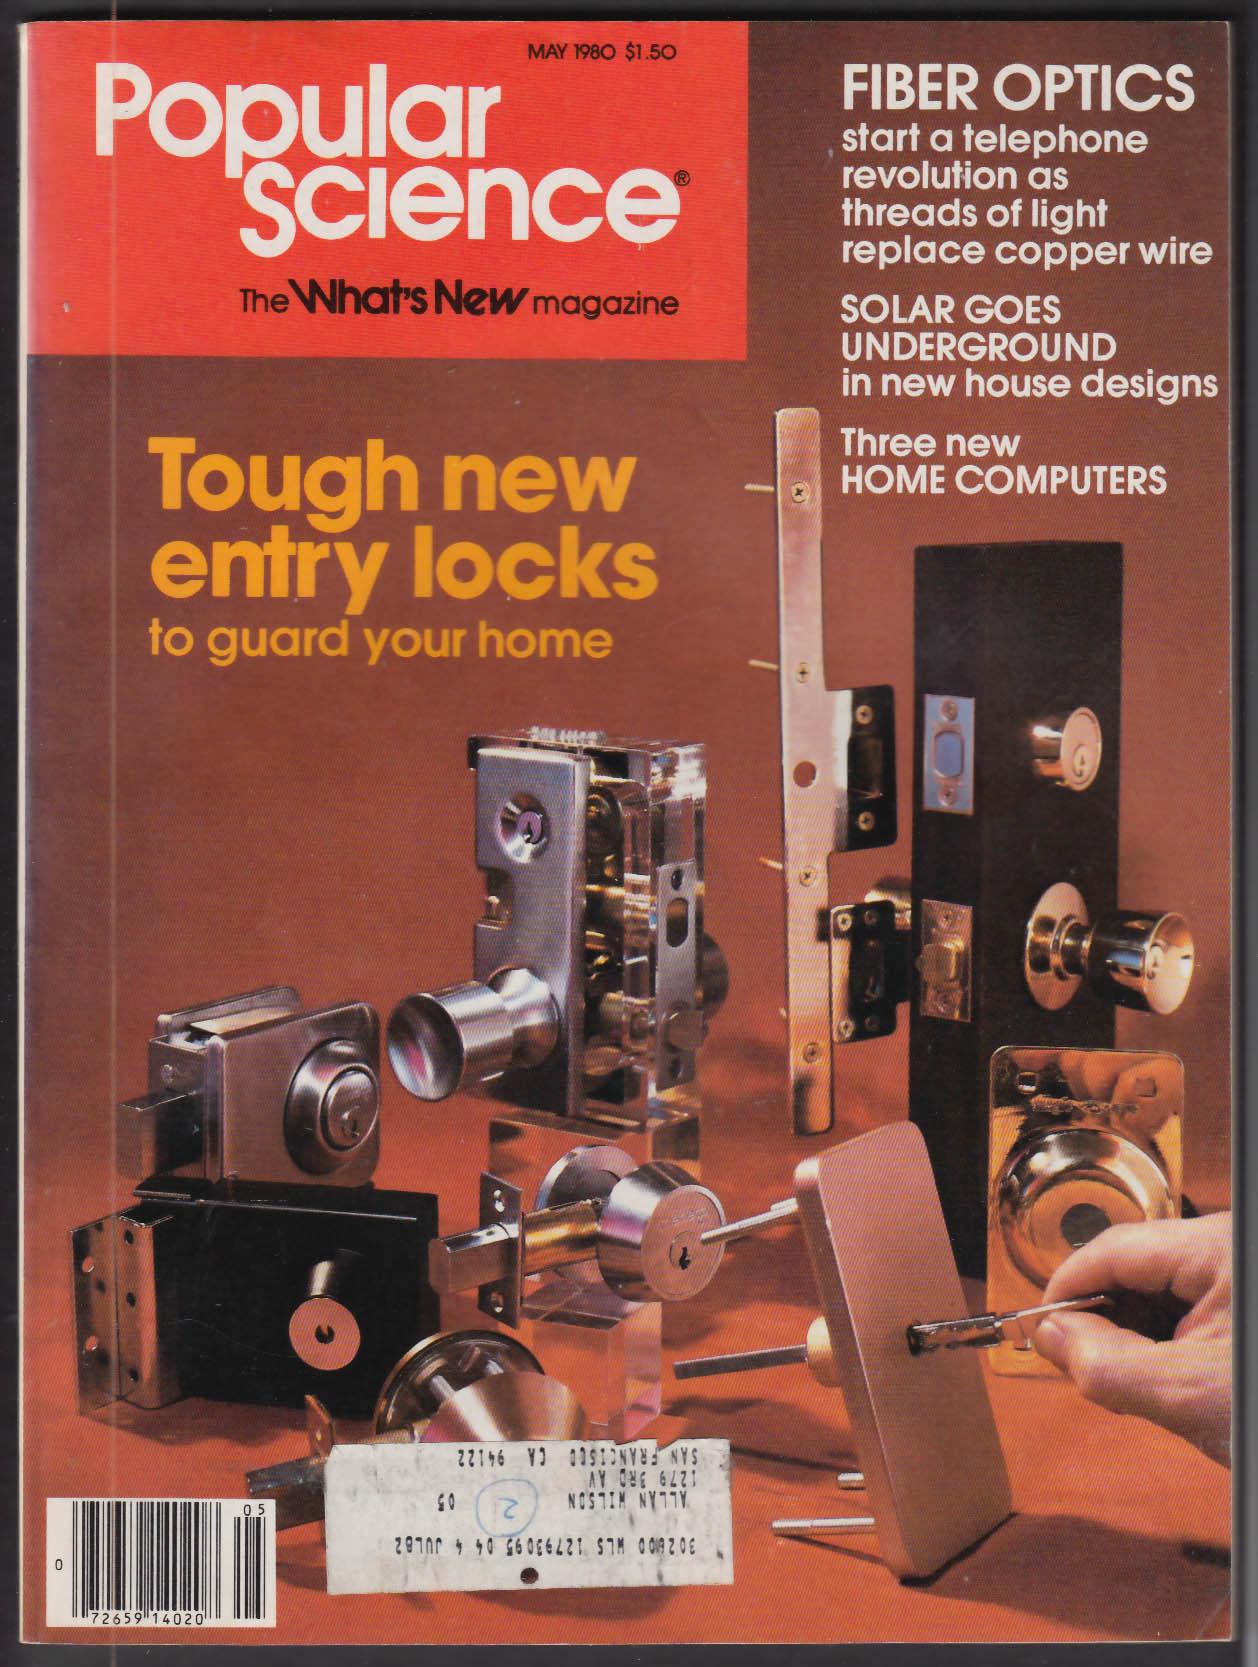 POPULAR SCIENCE Mercedes-Benz Aluminum V8 Solar Power Kuwait Oil 5 1980